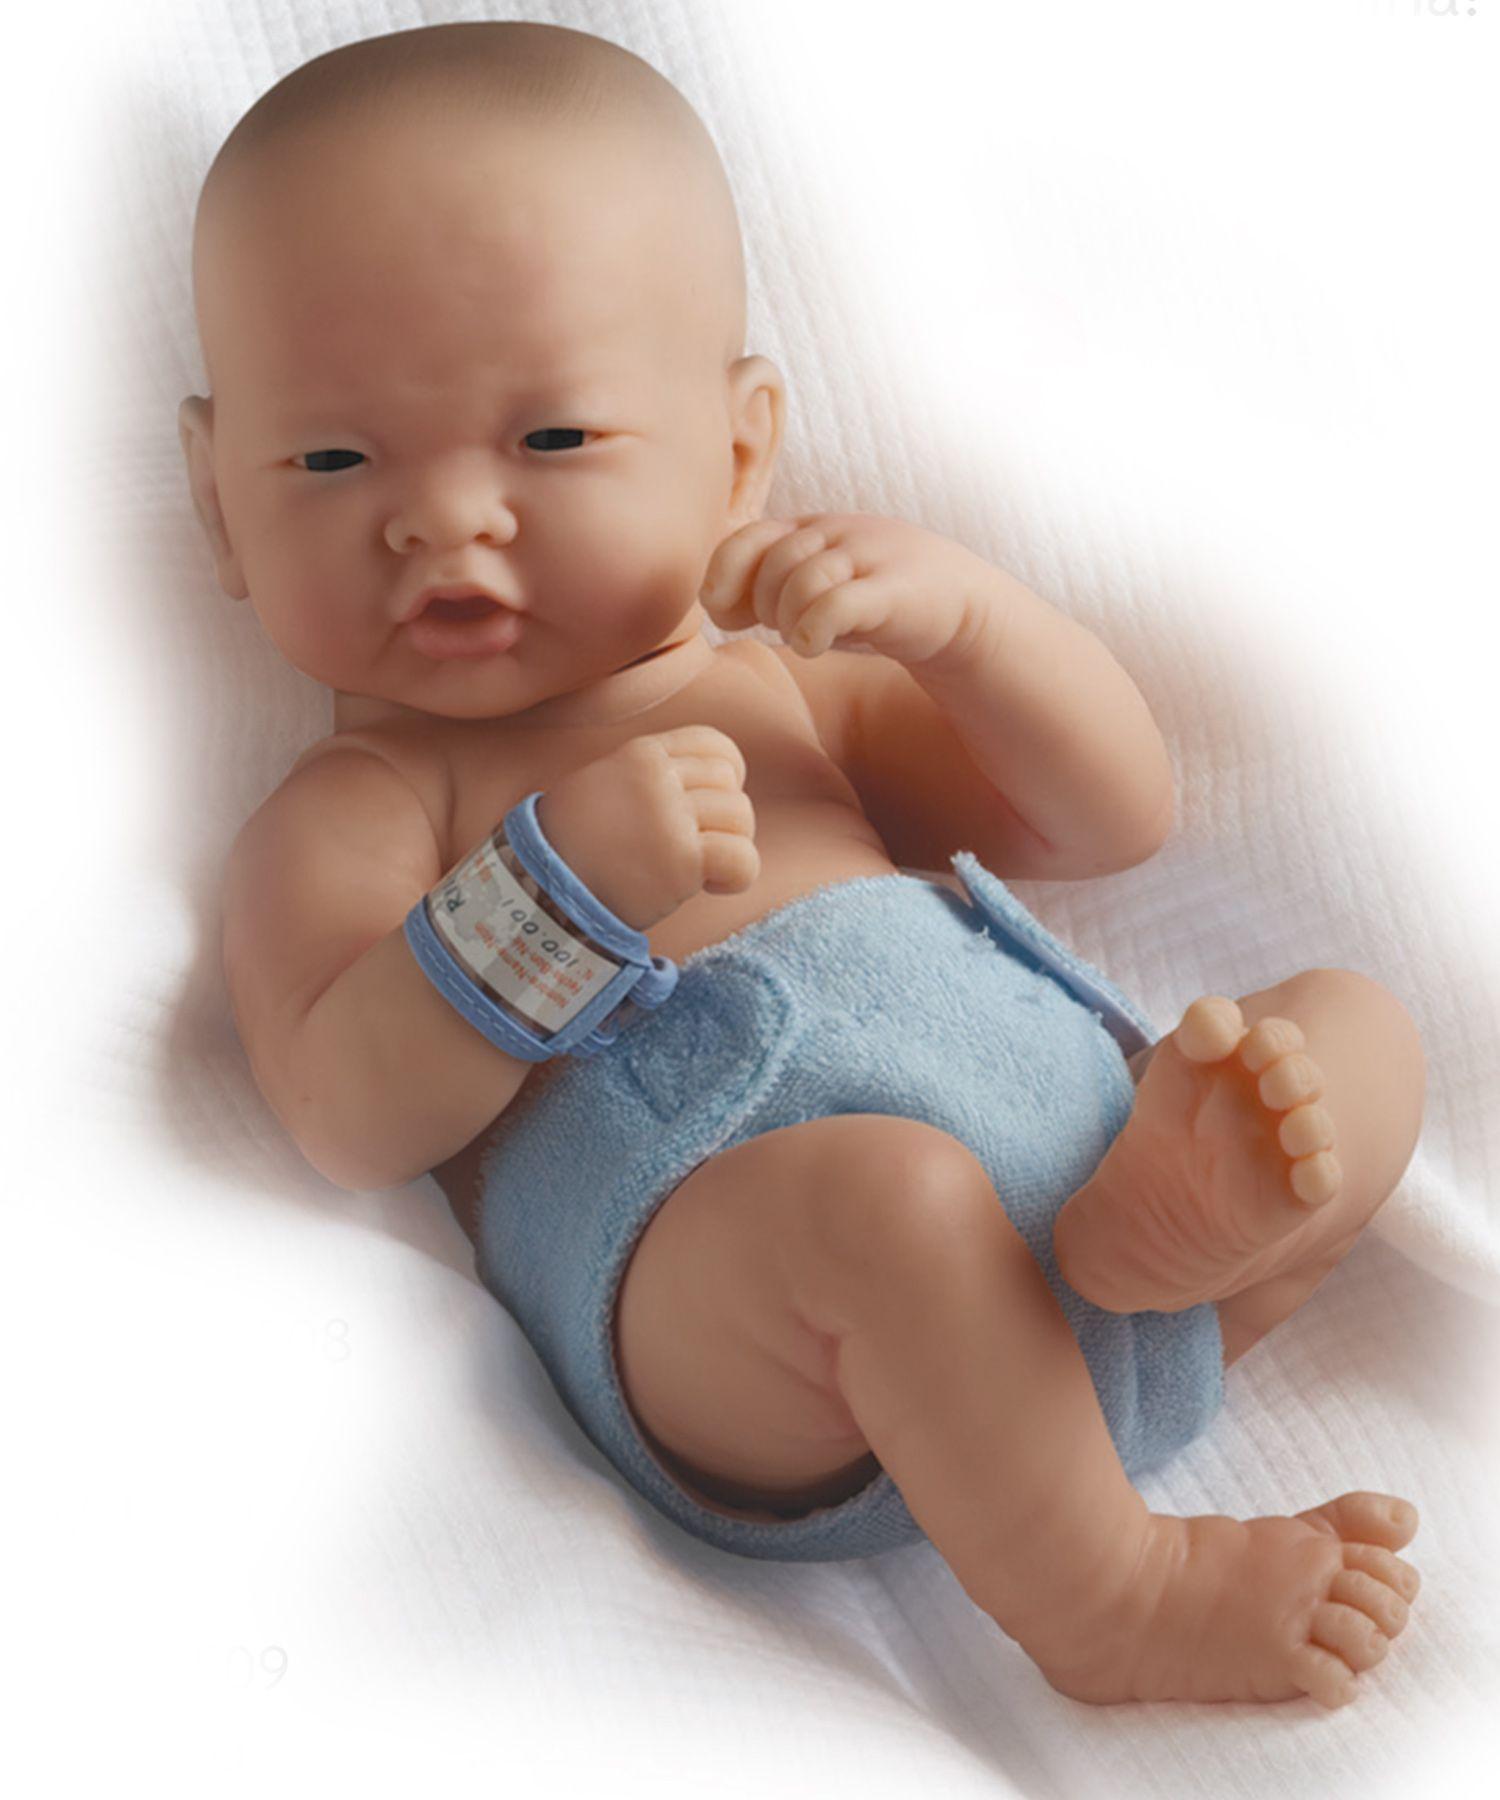 La Newborn Real Boy(Asian) 18508 by Berenguer Doll